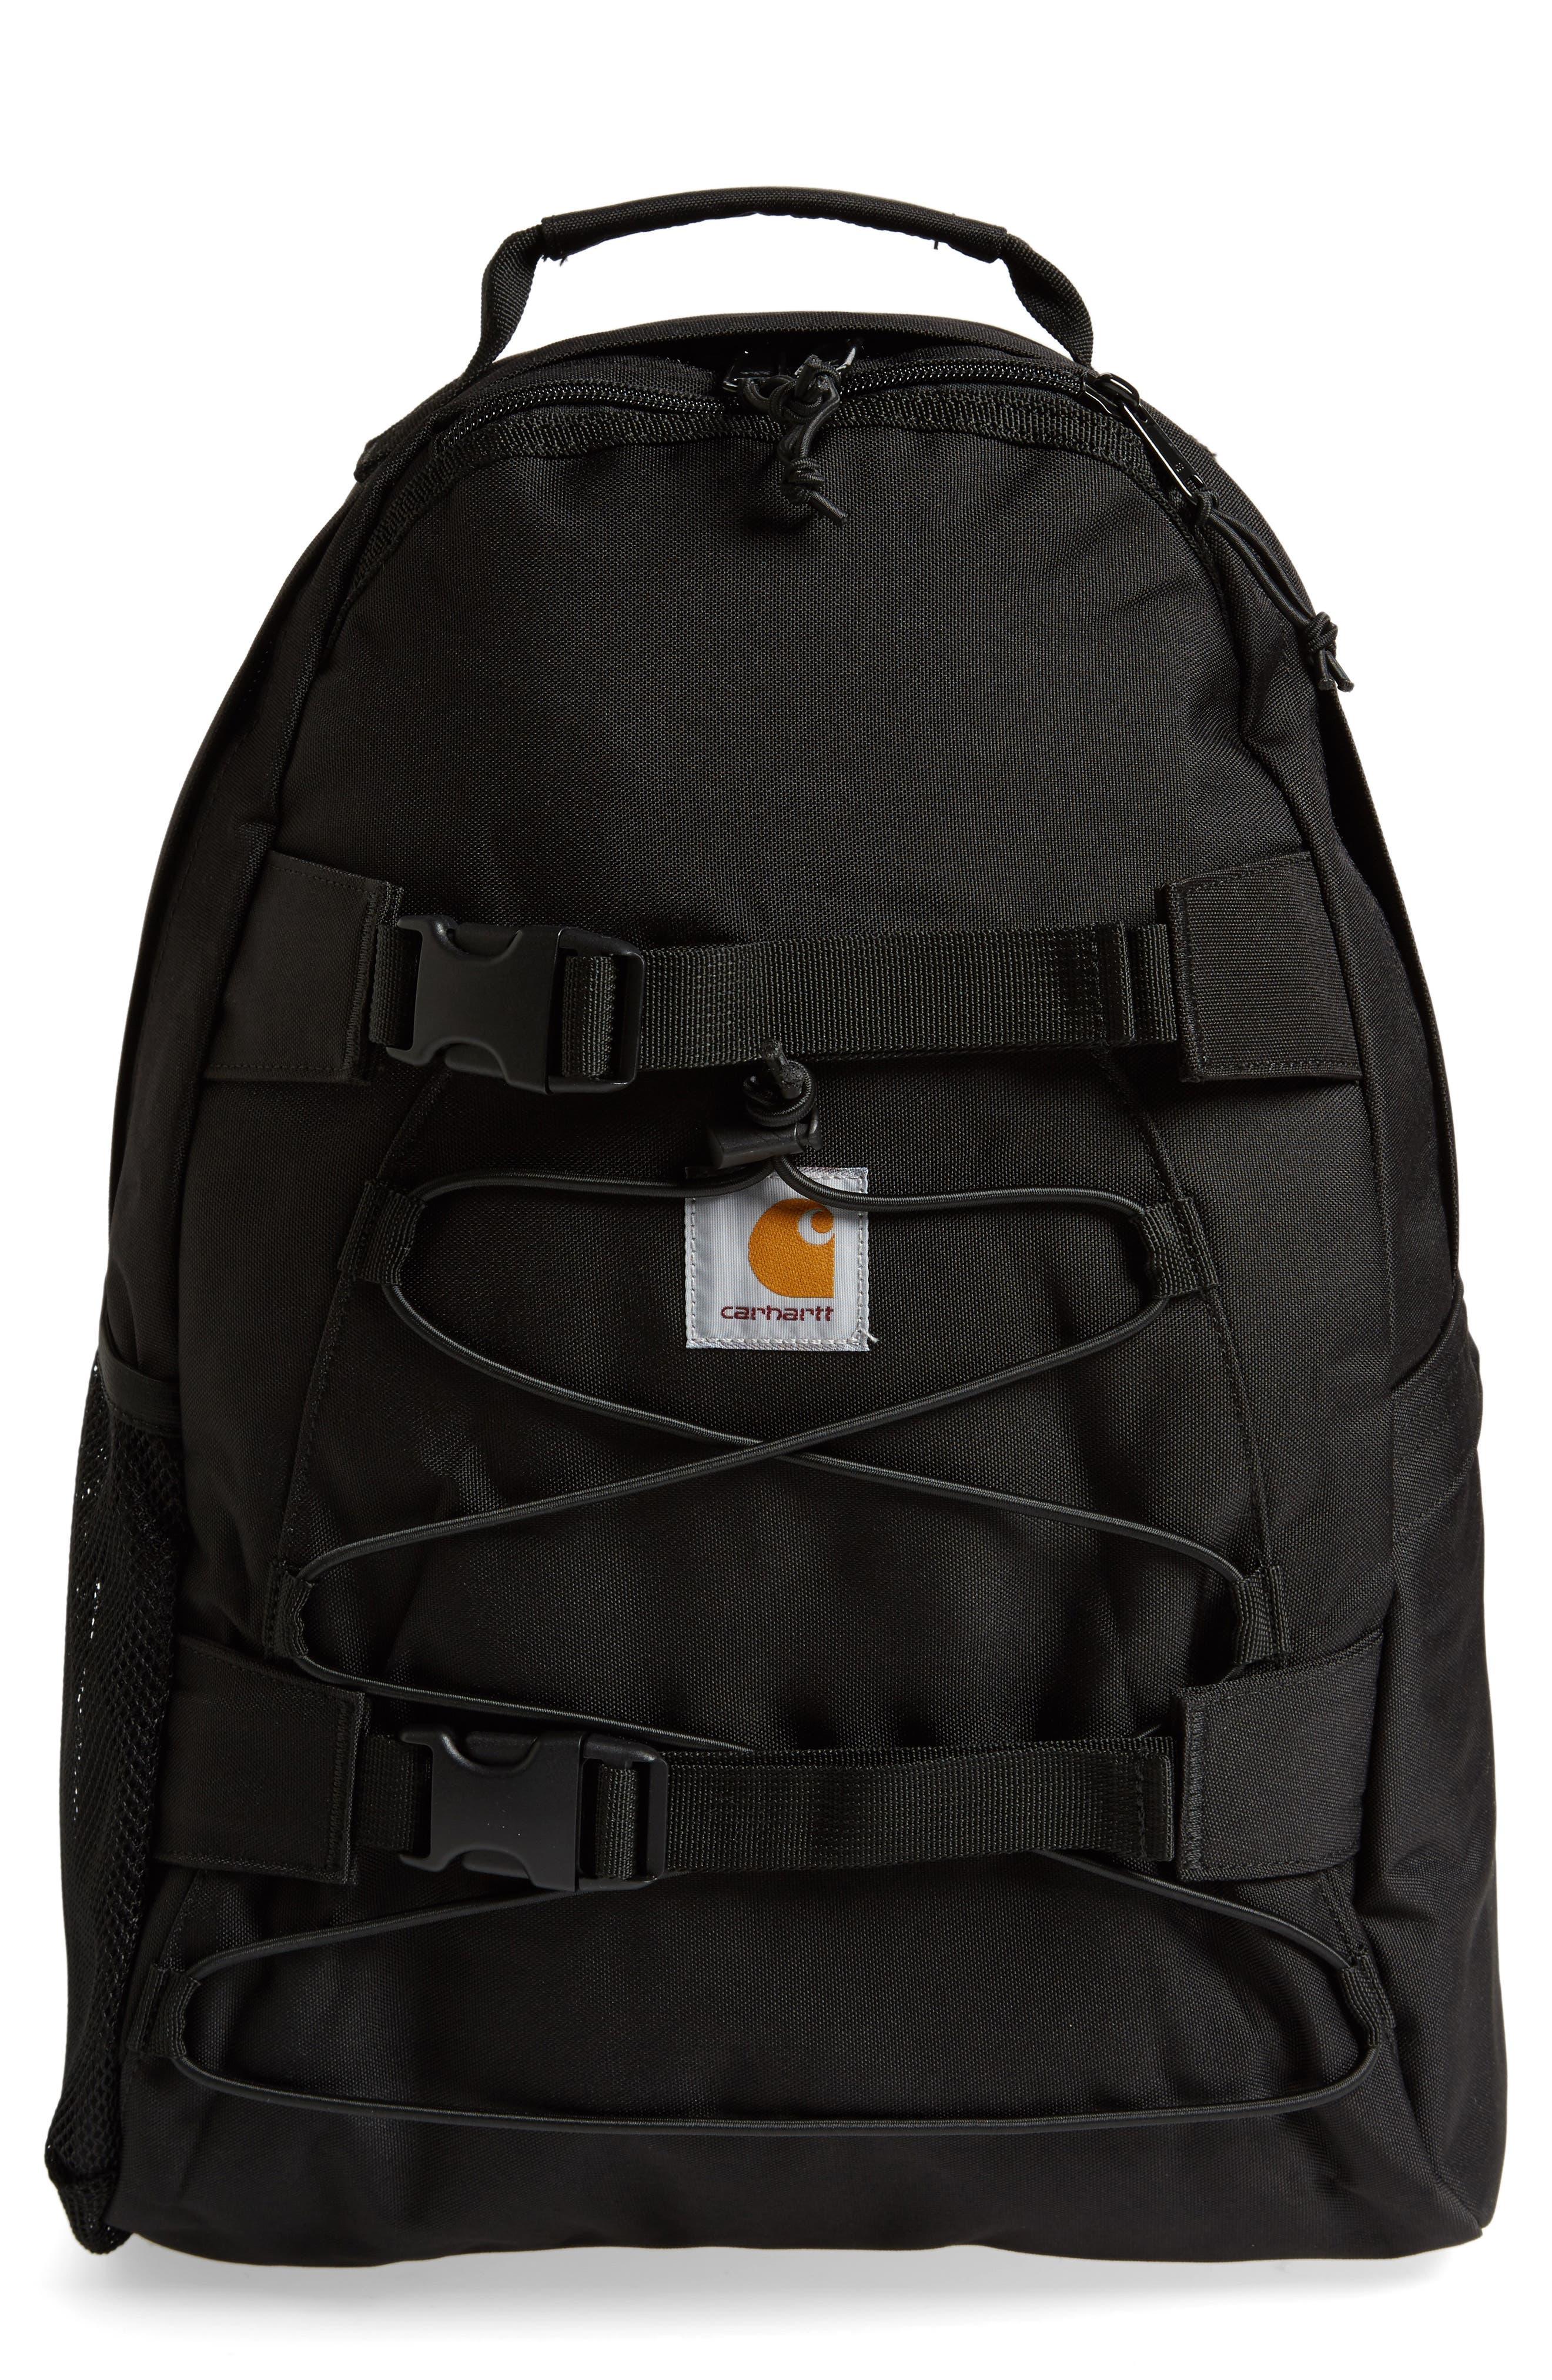 Carhartt Kickflip Backpack